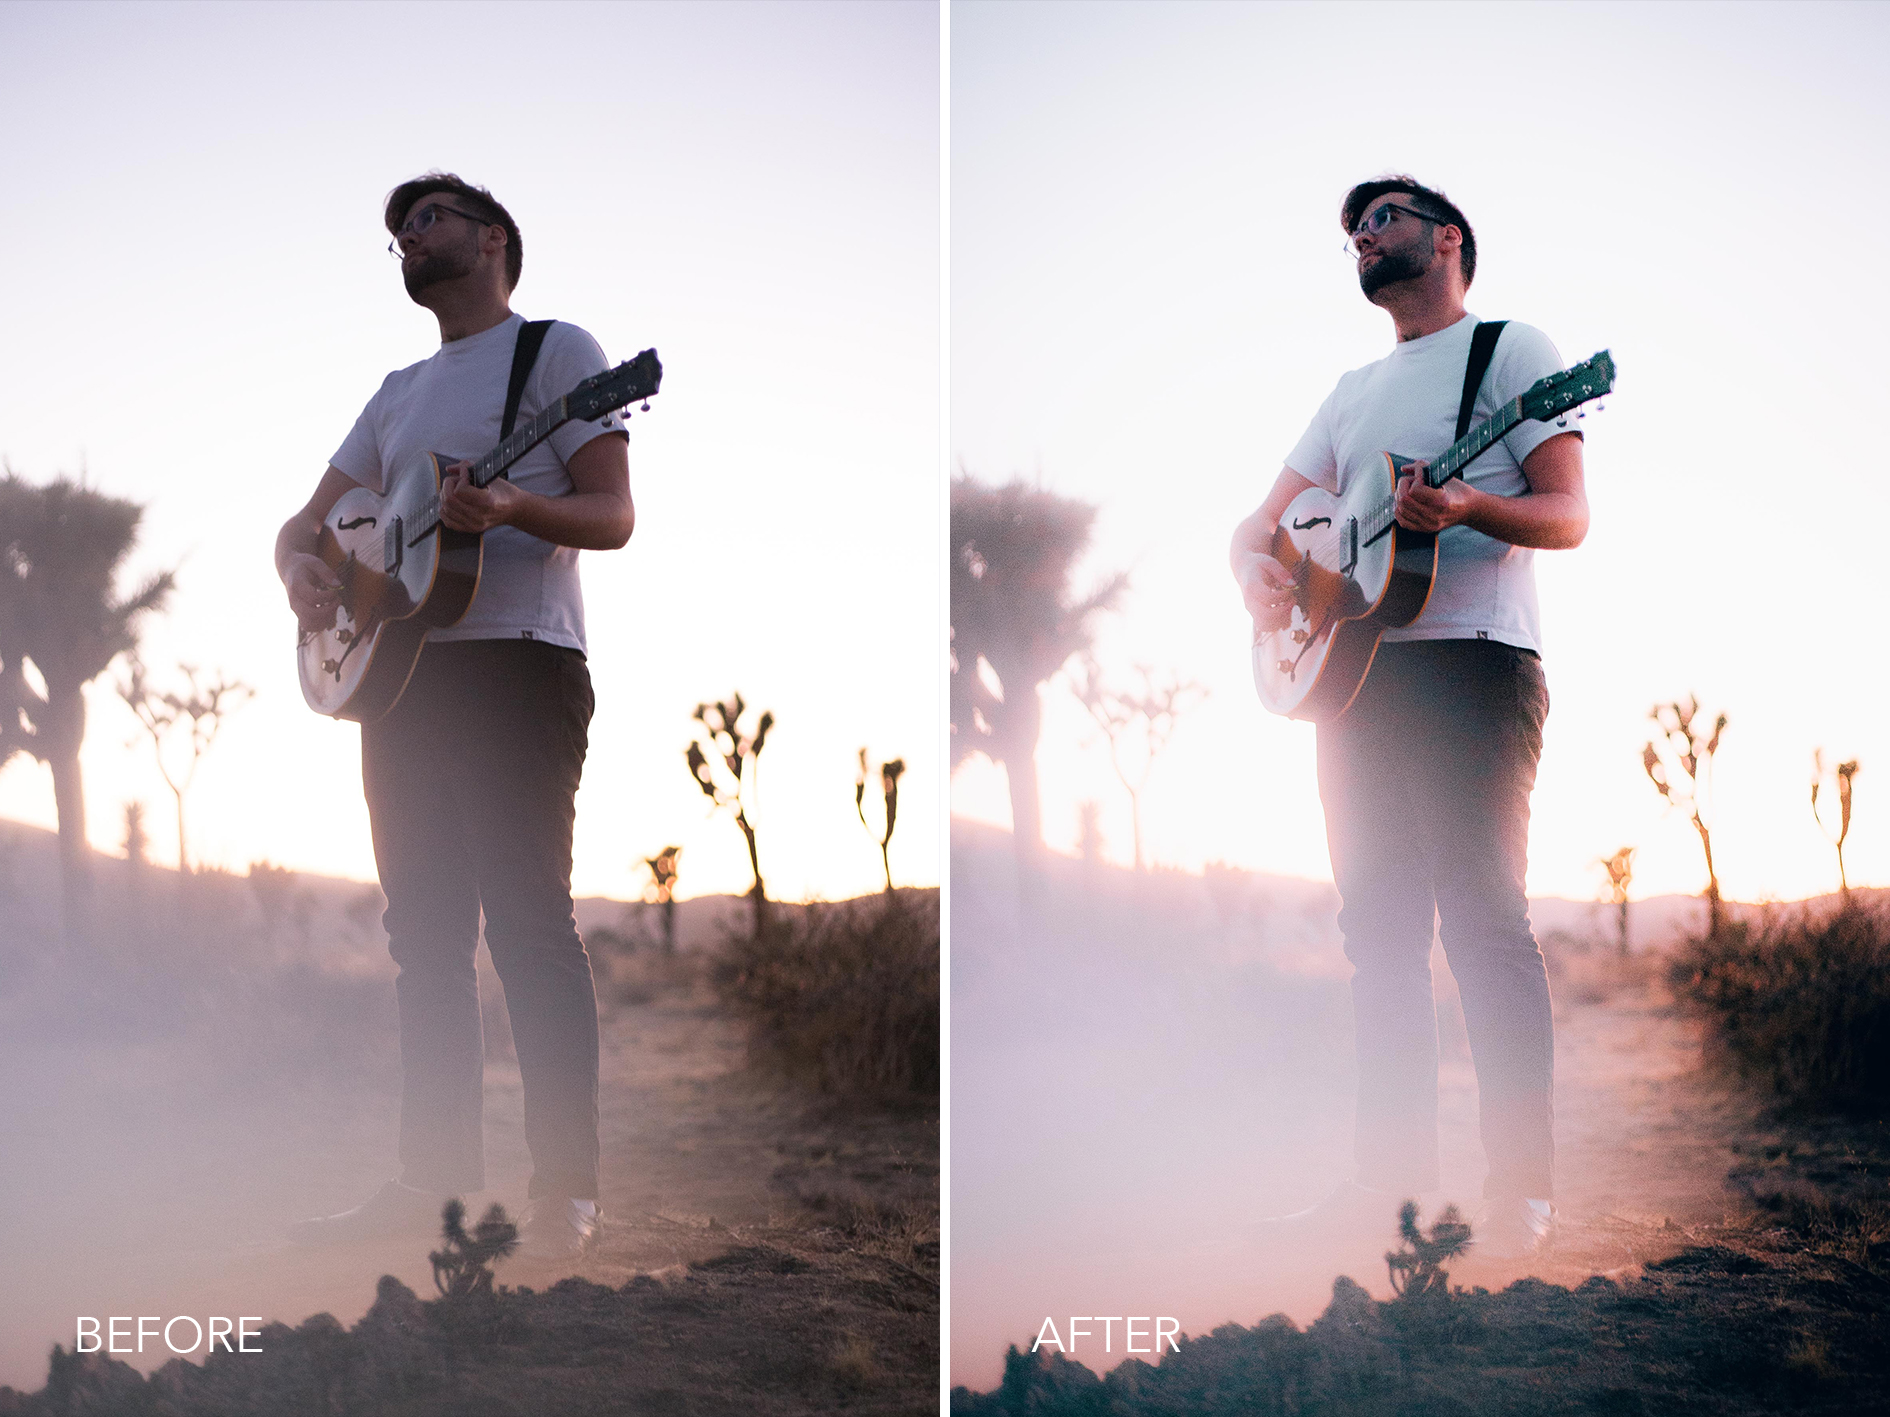 13.Outdoor Soft Light - Merrick Winter Live Music Lightroom Presets - FilterGrade